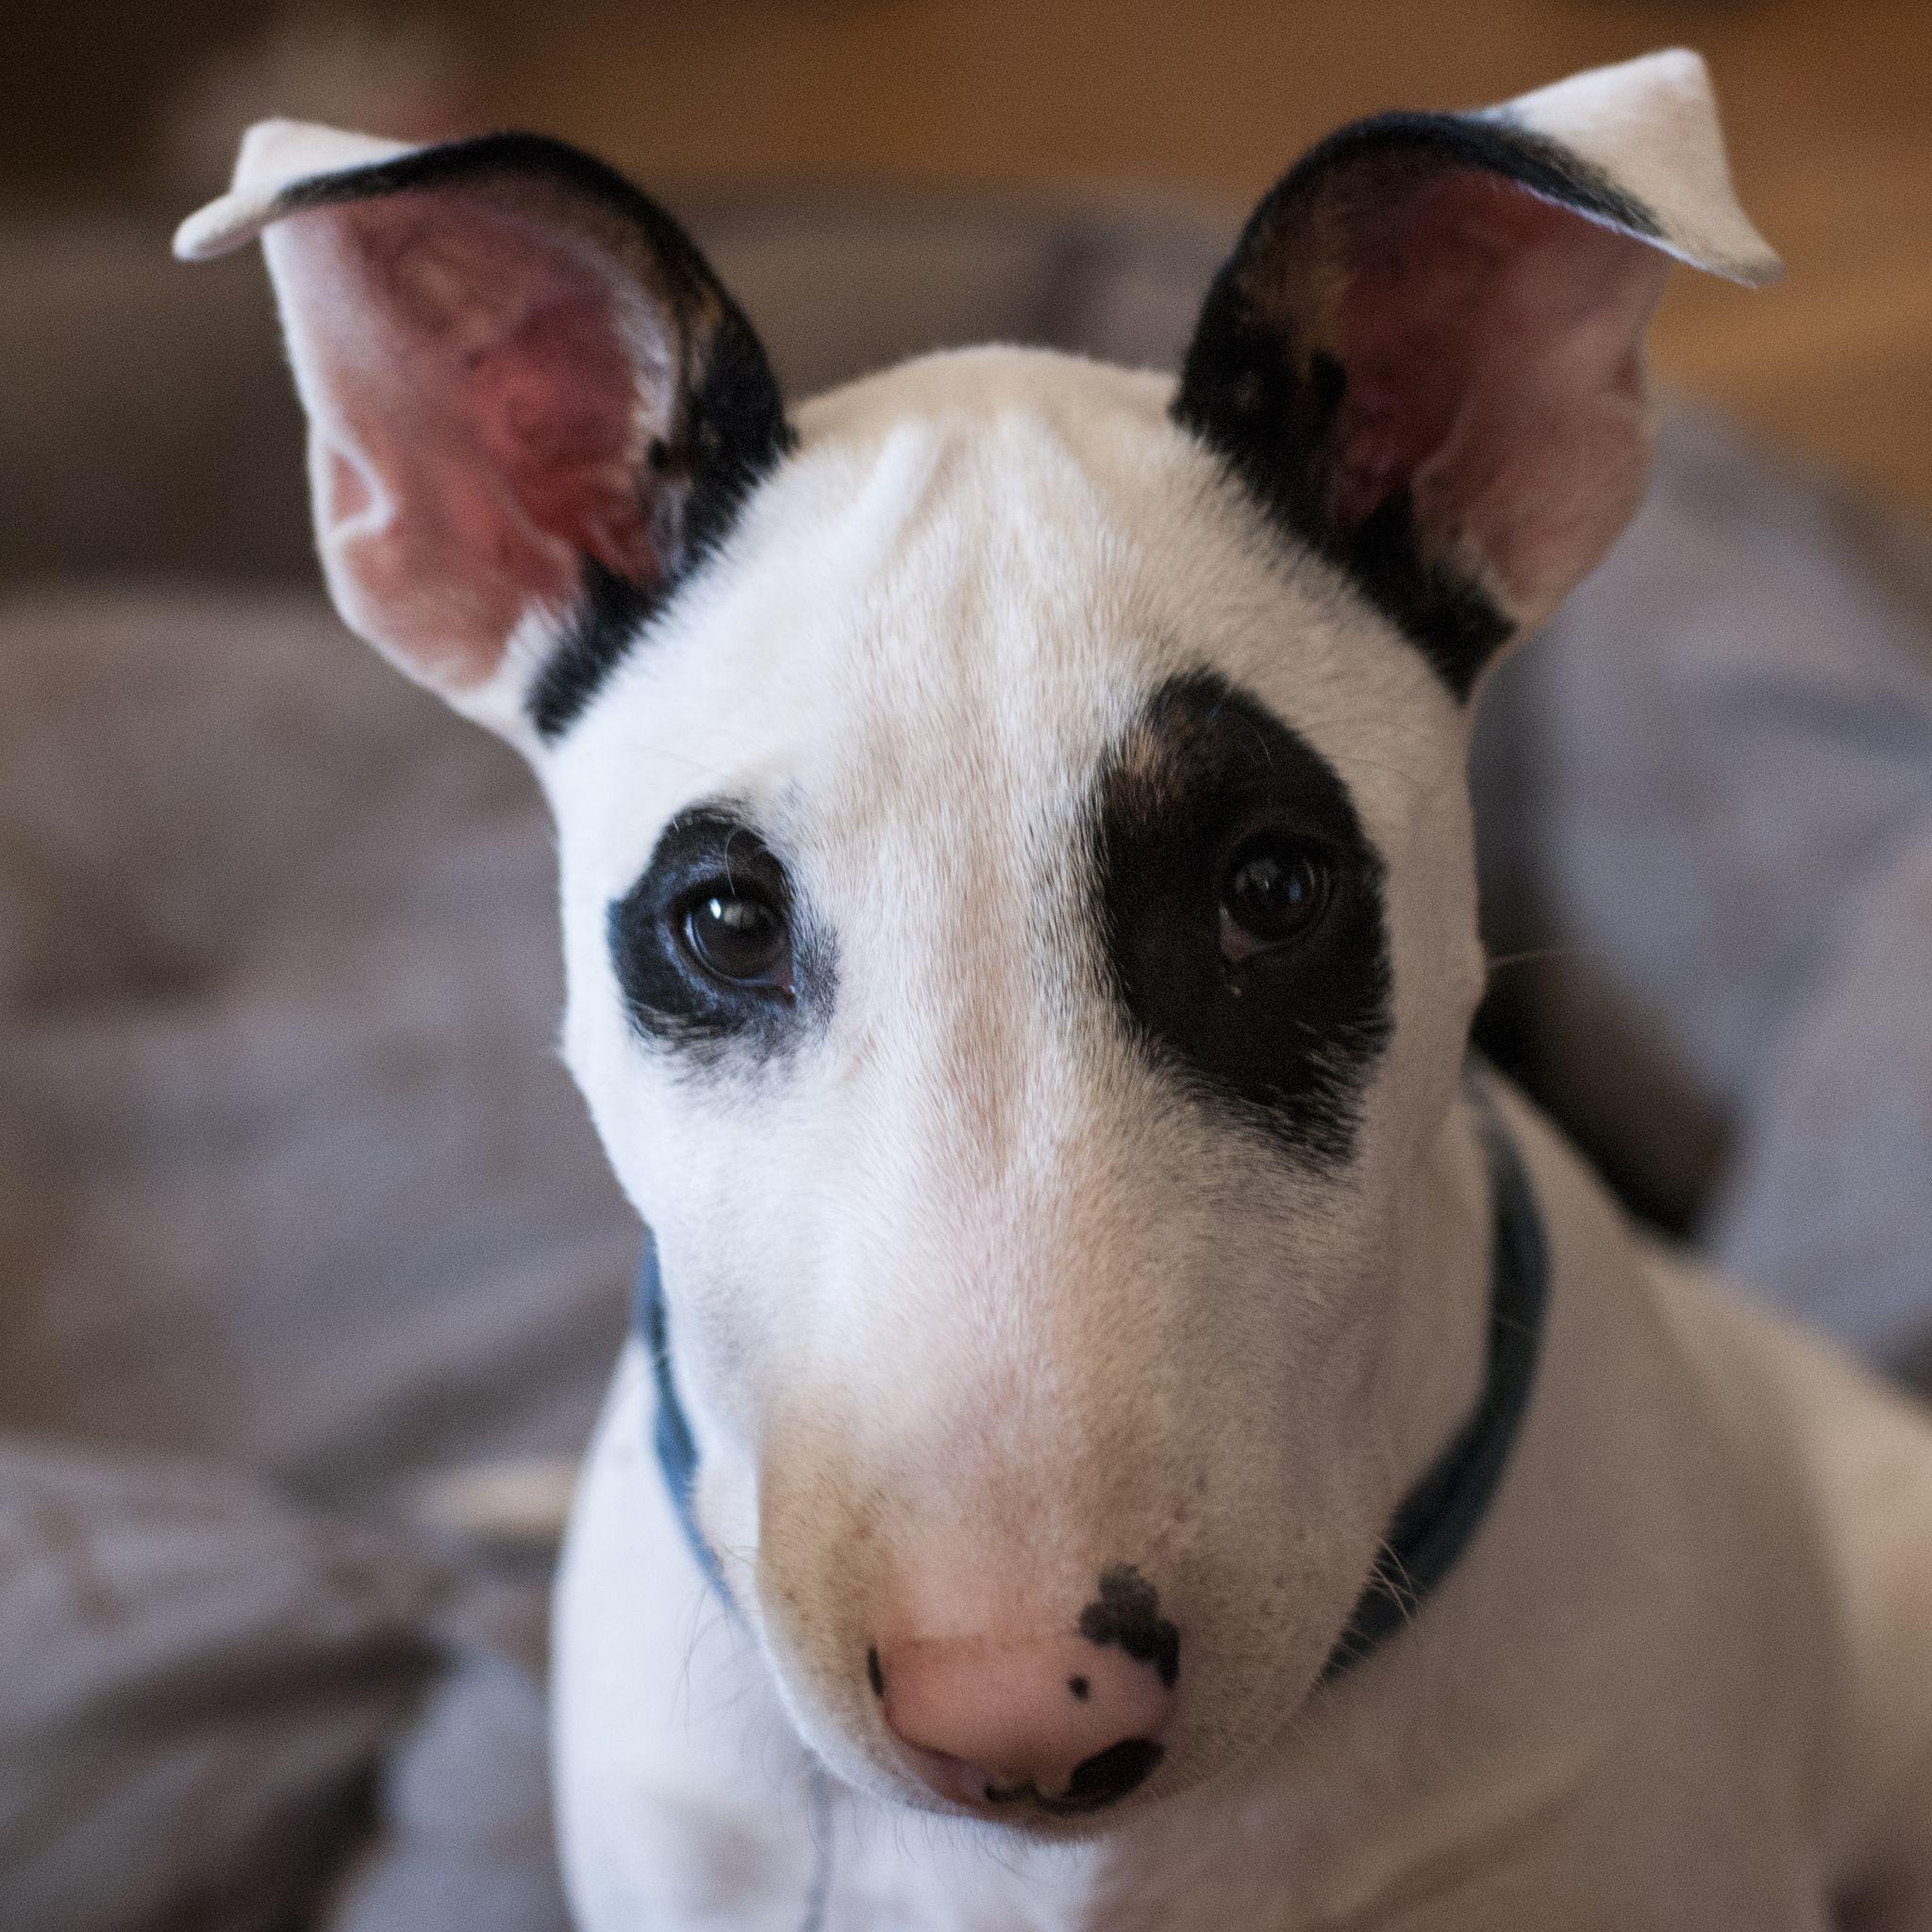 Bull Terrier - razas de perros